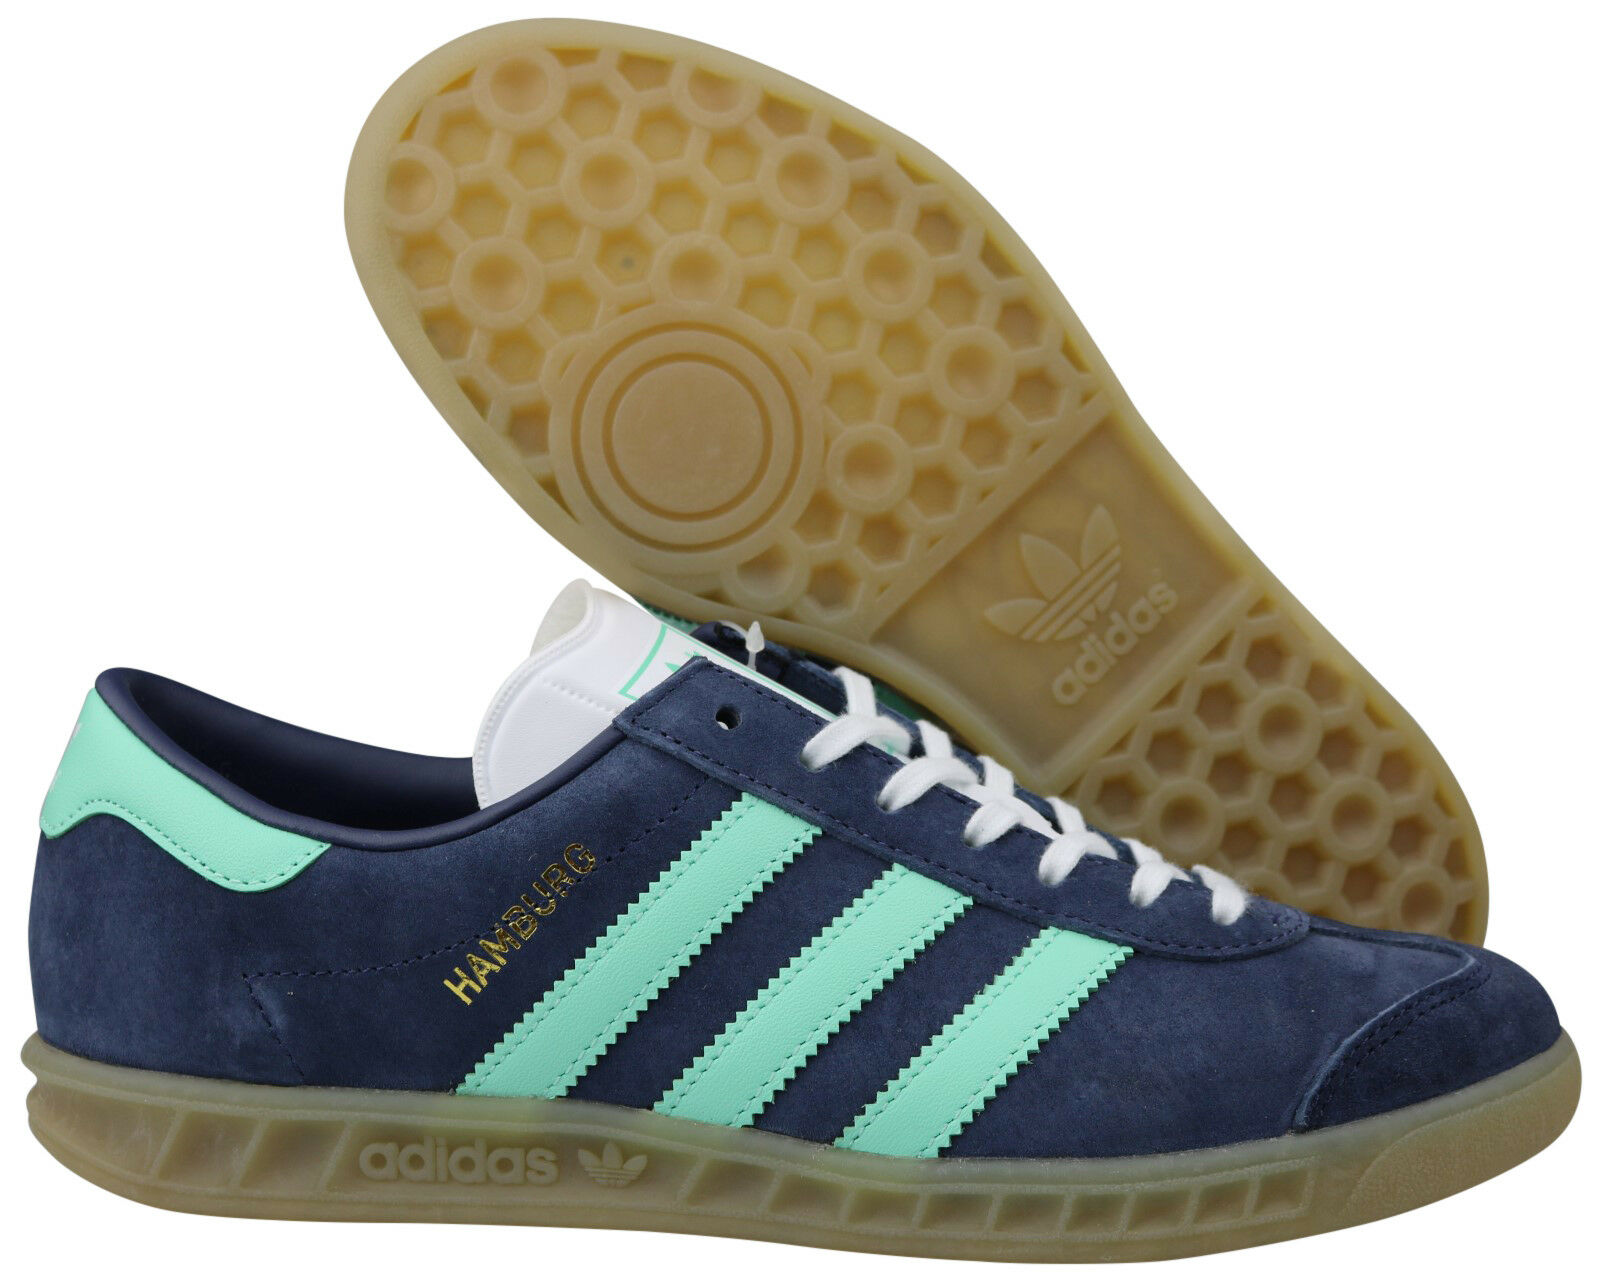 ADIDAS Originals Amburgo W scarpe da ginnastica Donna 36 Scarpe Blu bb5112 Taglia 36 Donna - 40,5 NUOVO OVP 789c88